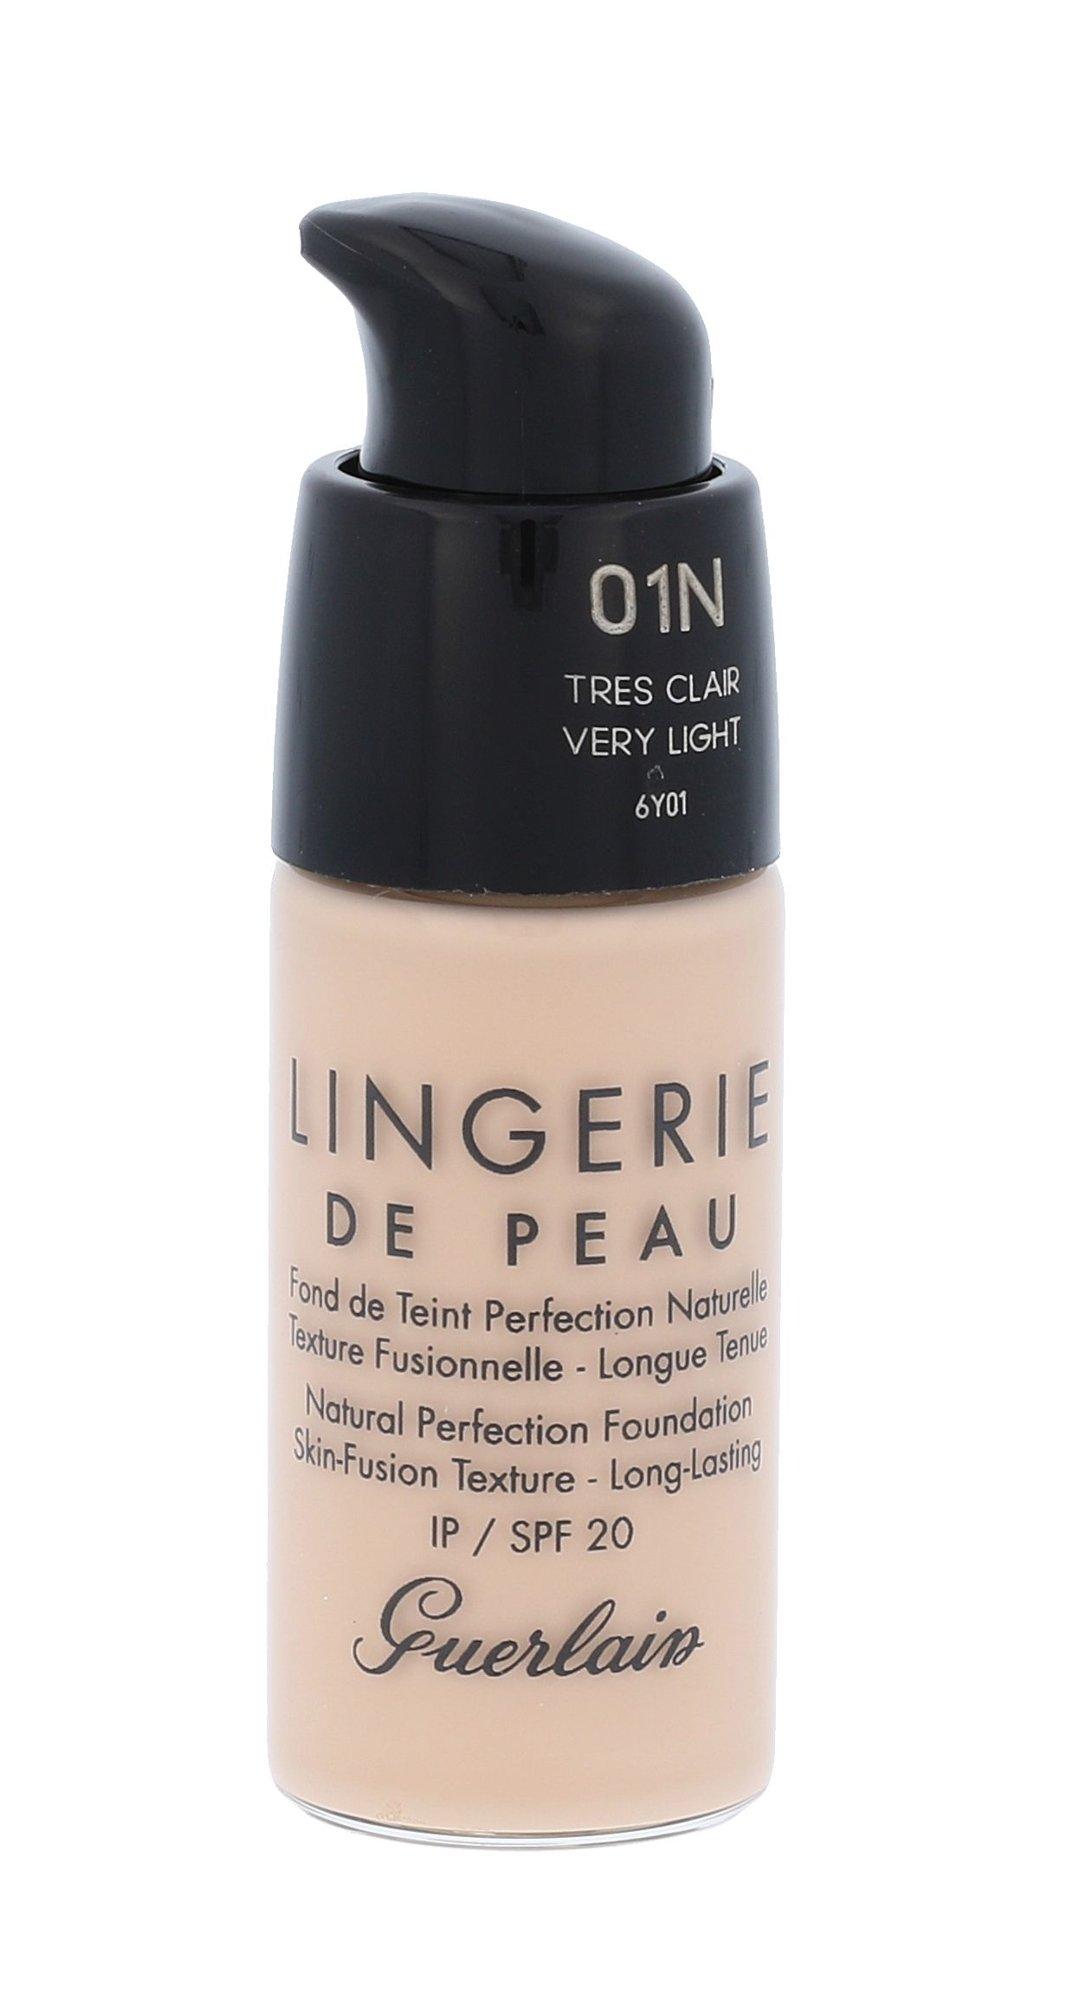 Guerlain Lingerie De Peau Cosmetic 15ml 01N Very Light